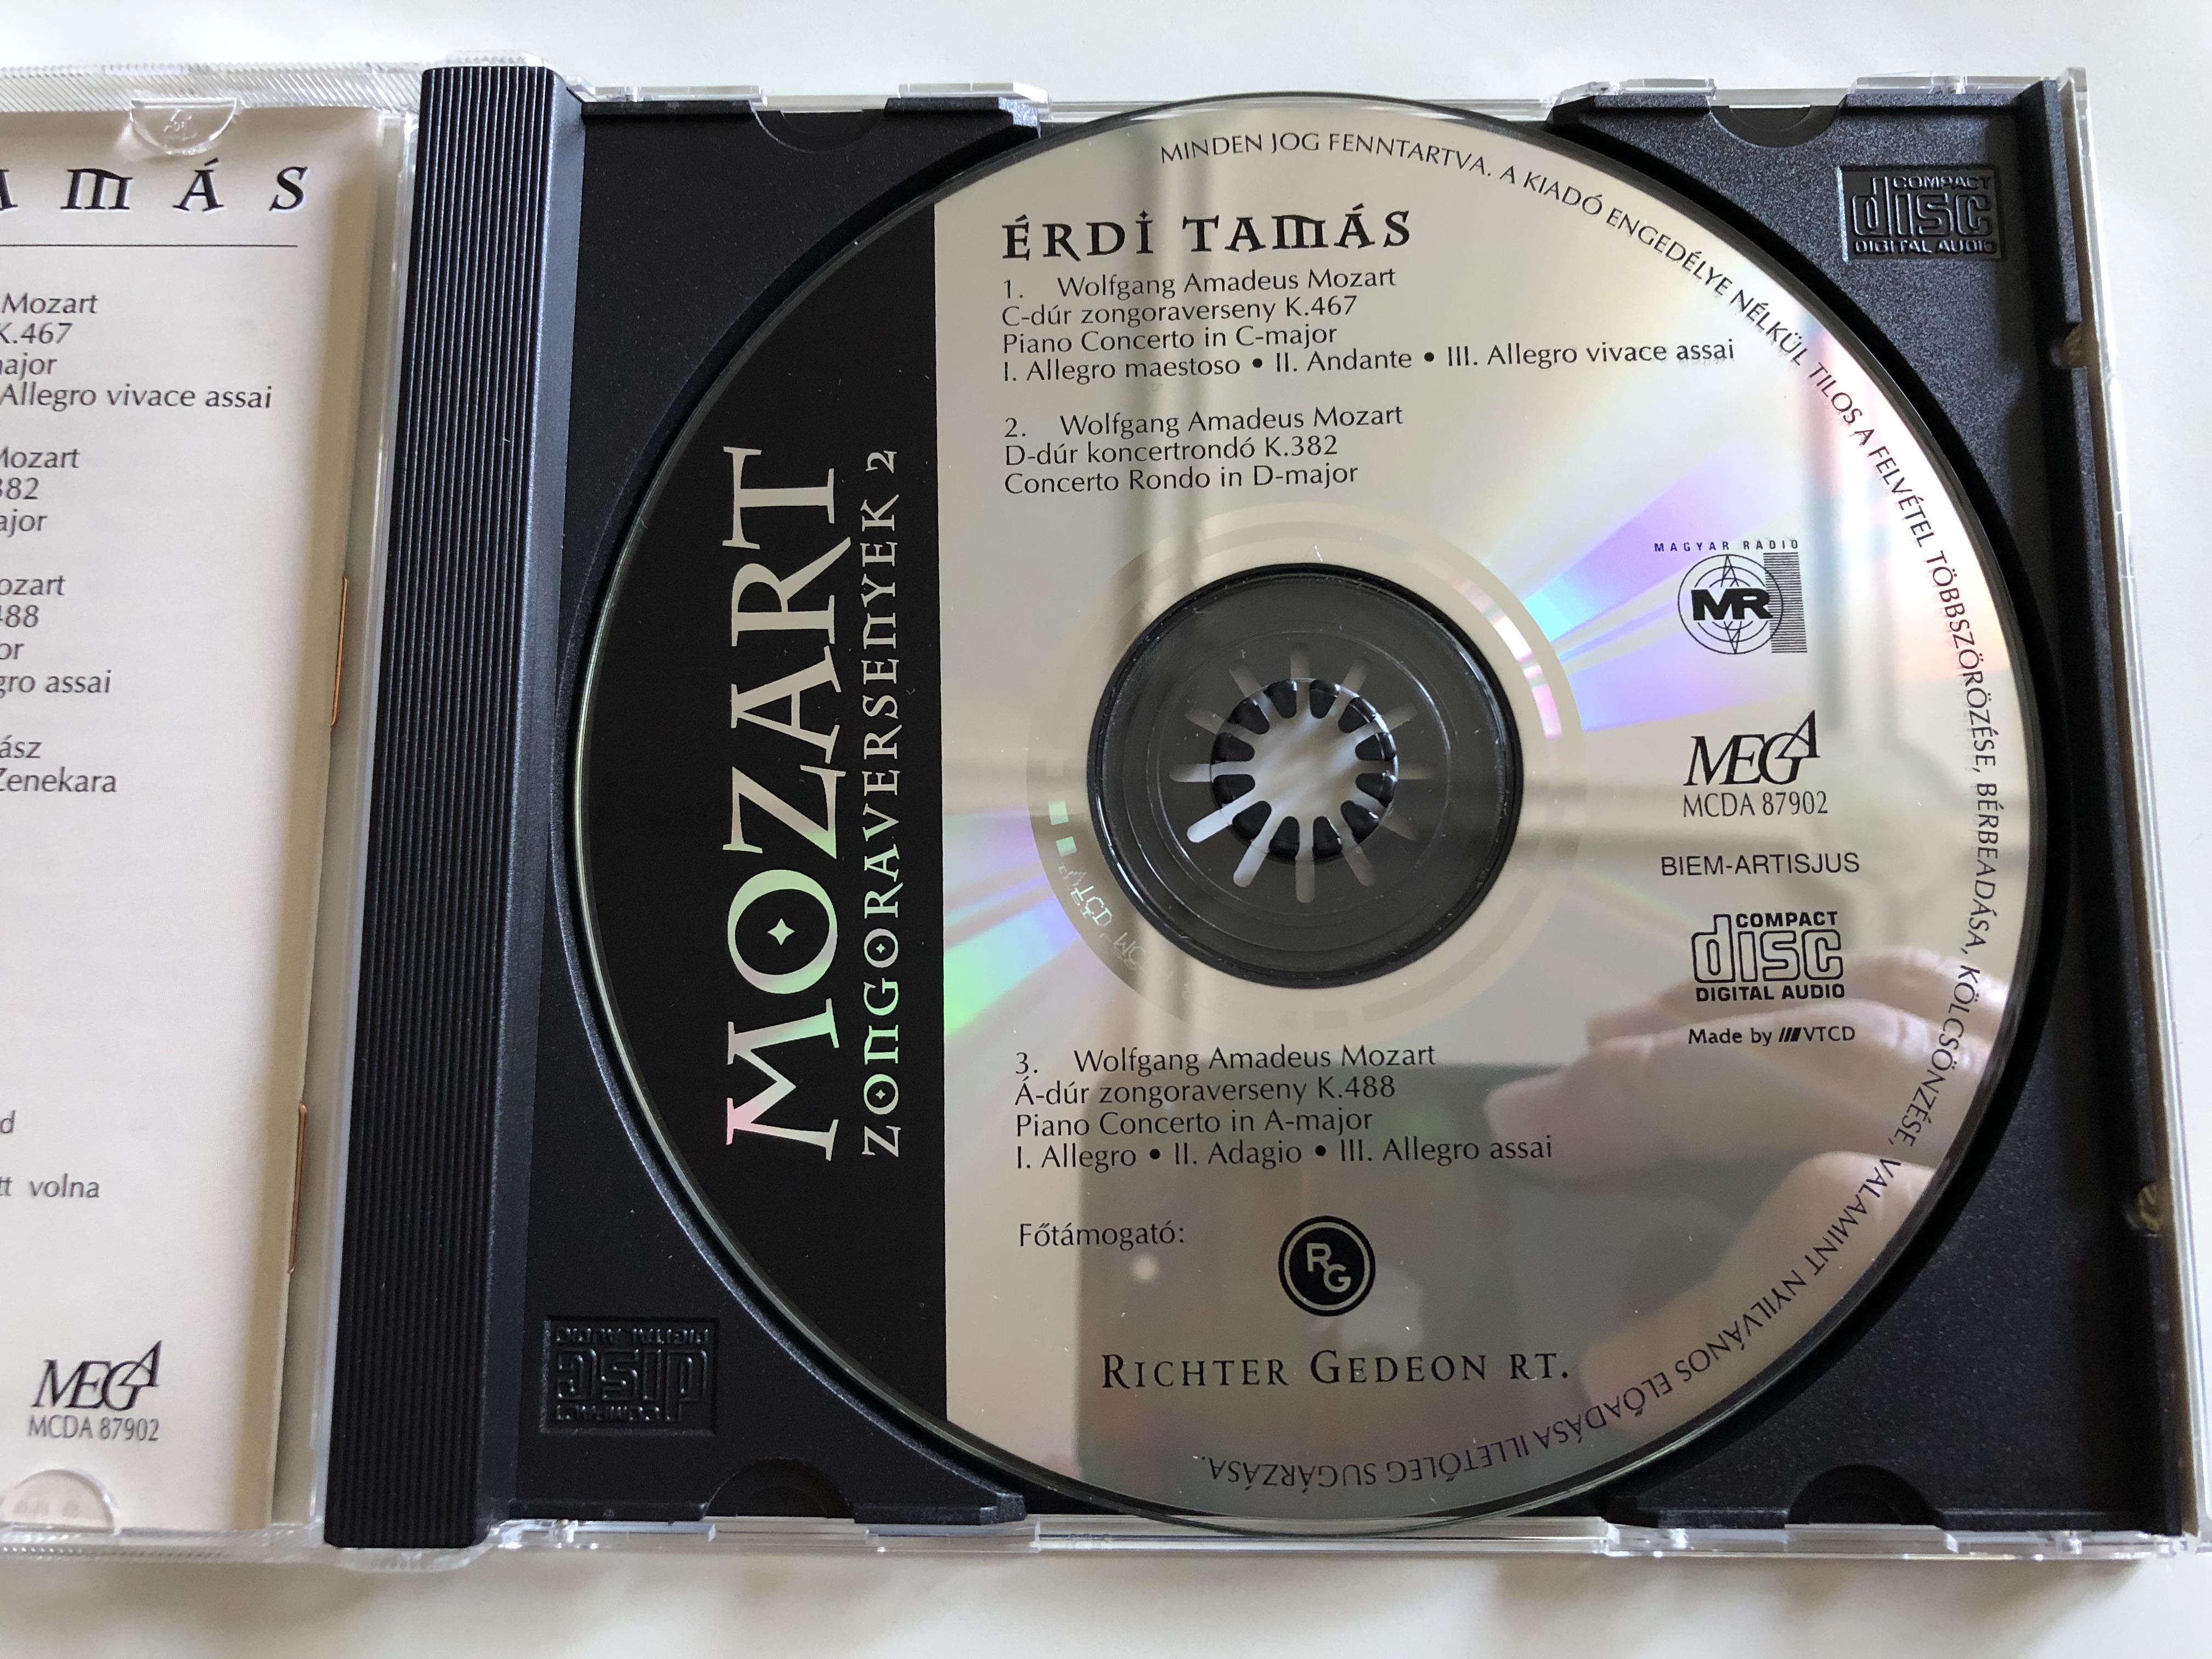 mozart-zongoraversenyek-2-erdi-tamas-mega-audio-cd-mcda-87902-9-.jpg